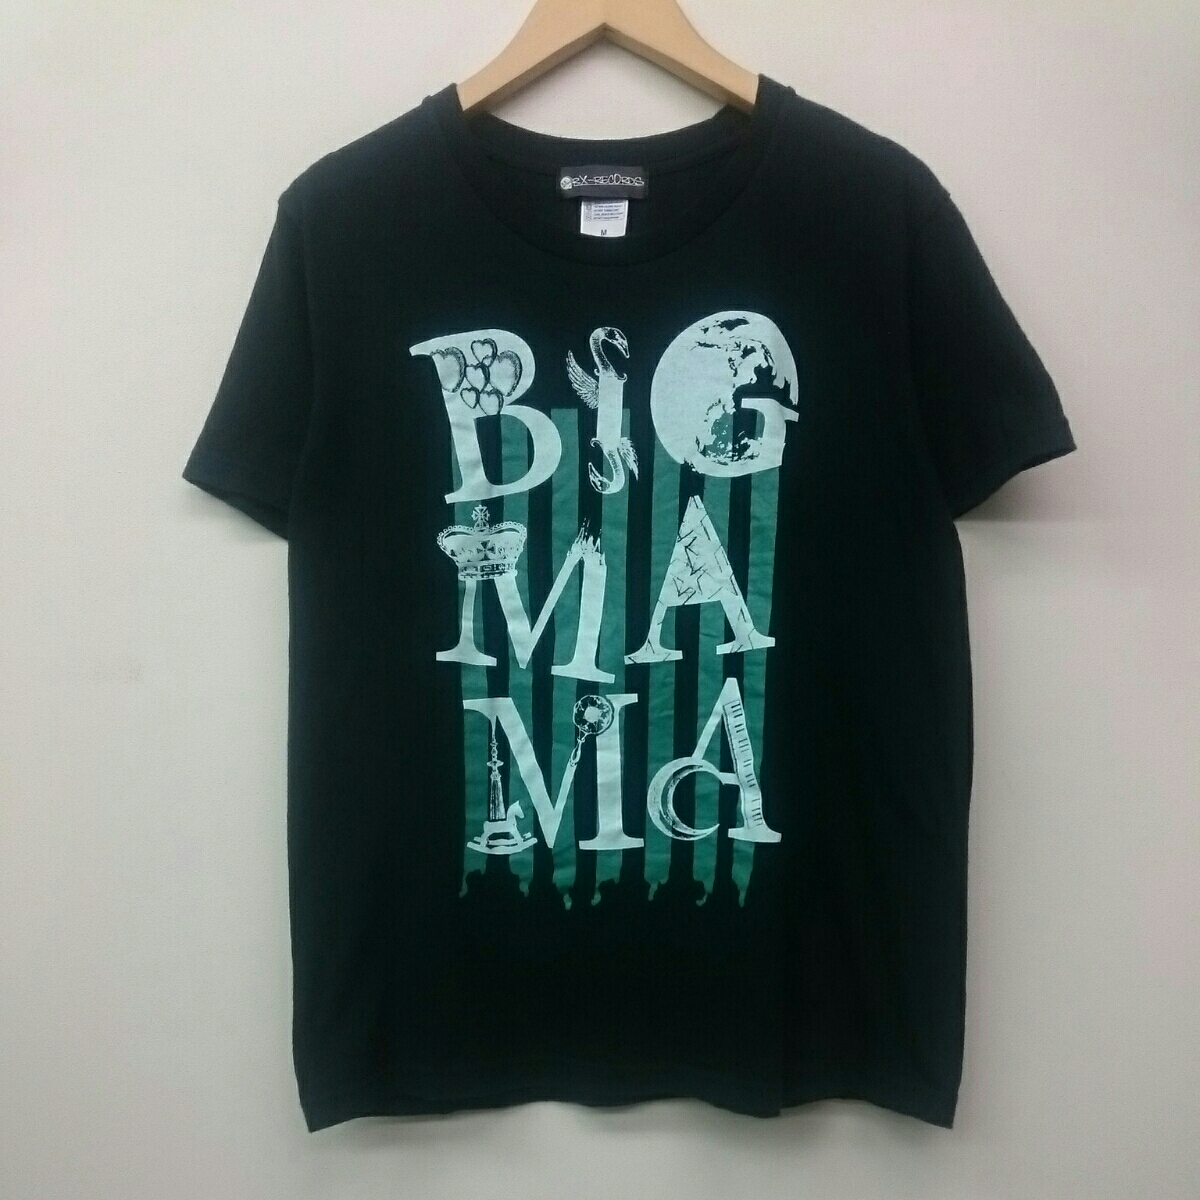 BIGMAMA ビッグママ Roclassick TOUR 2014 RX-RECORDS Tシャツ Mサイズ ロックバンド ライブグッズの画像